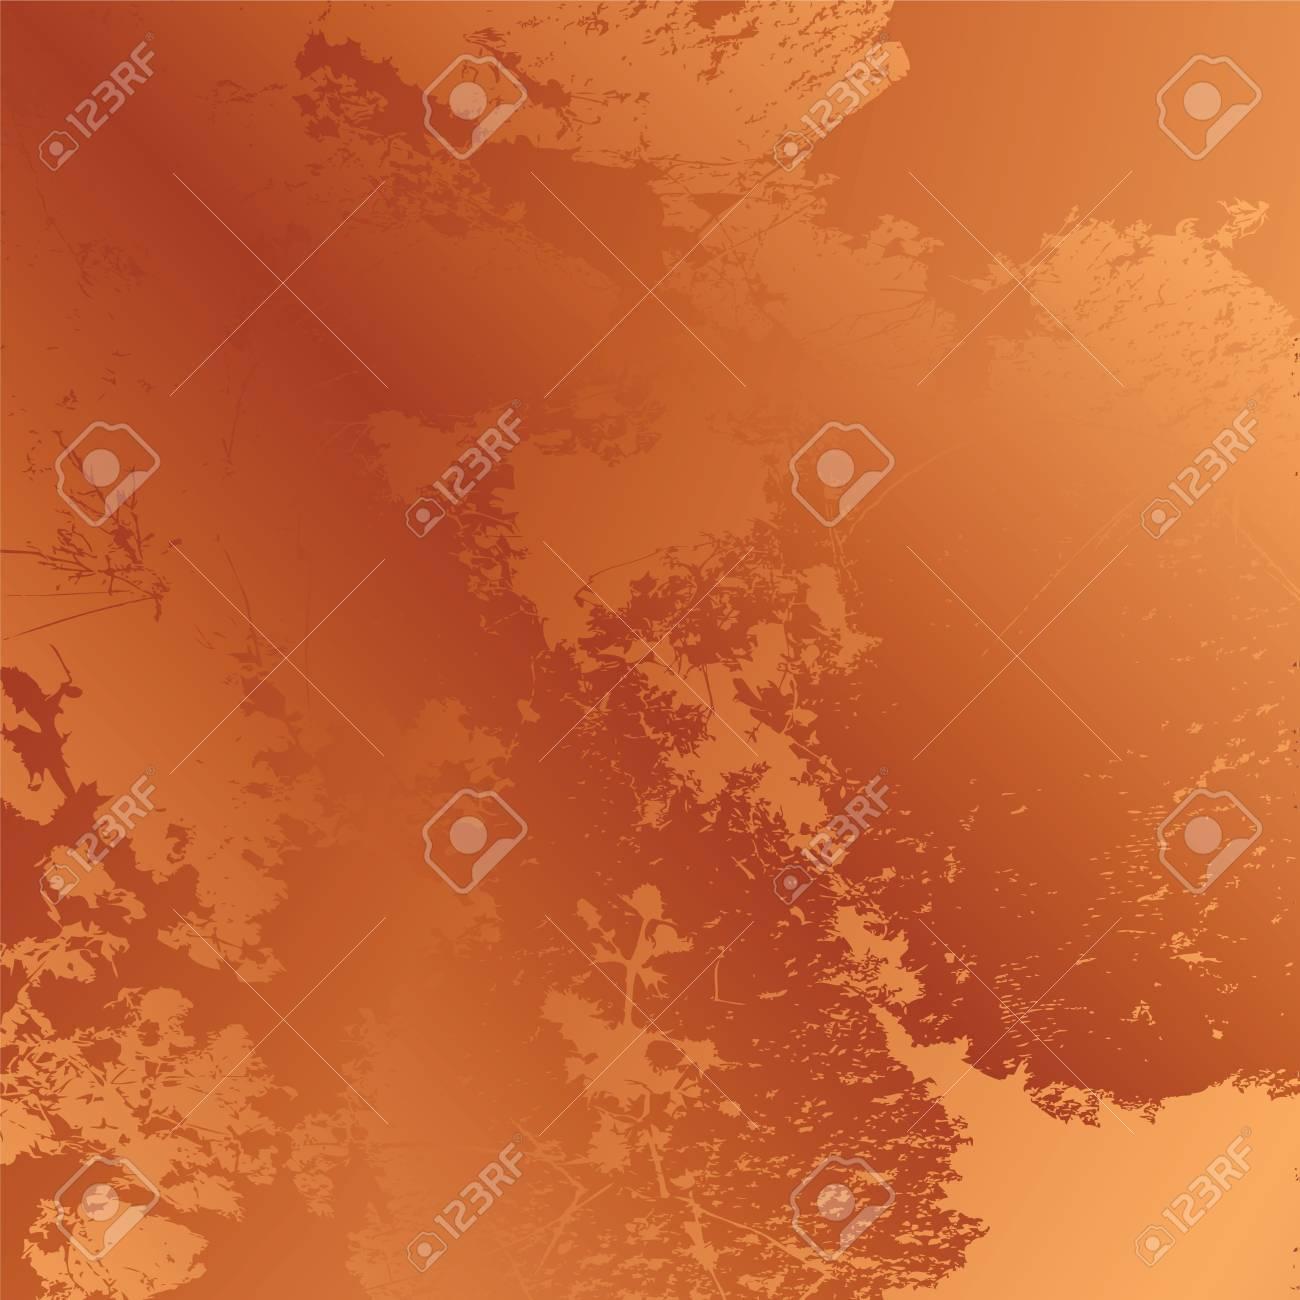 Rusty metal-grunge texture, art Stock Photo - 6197120